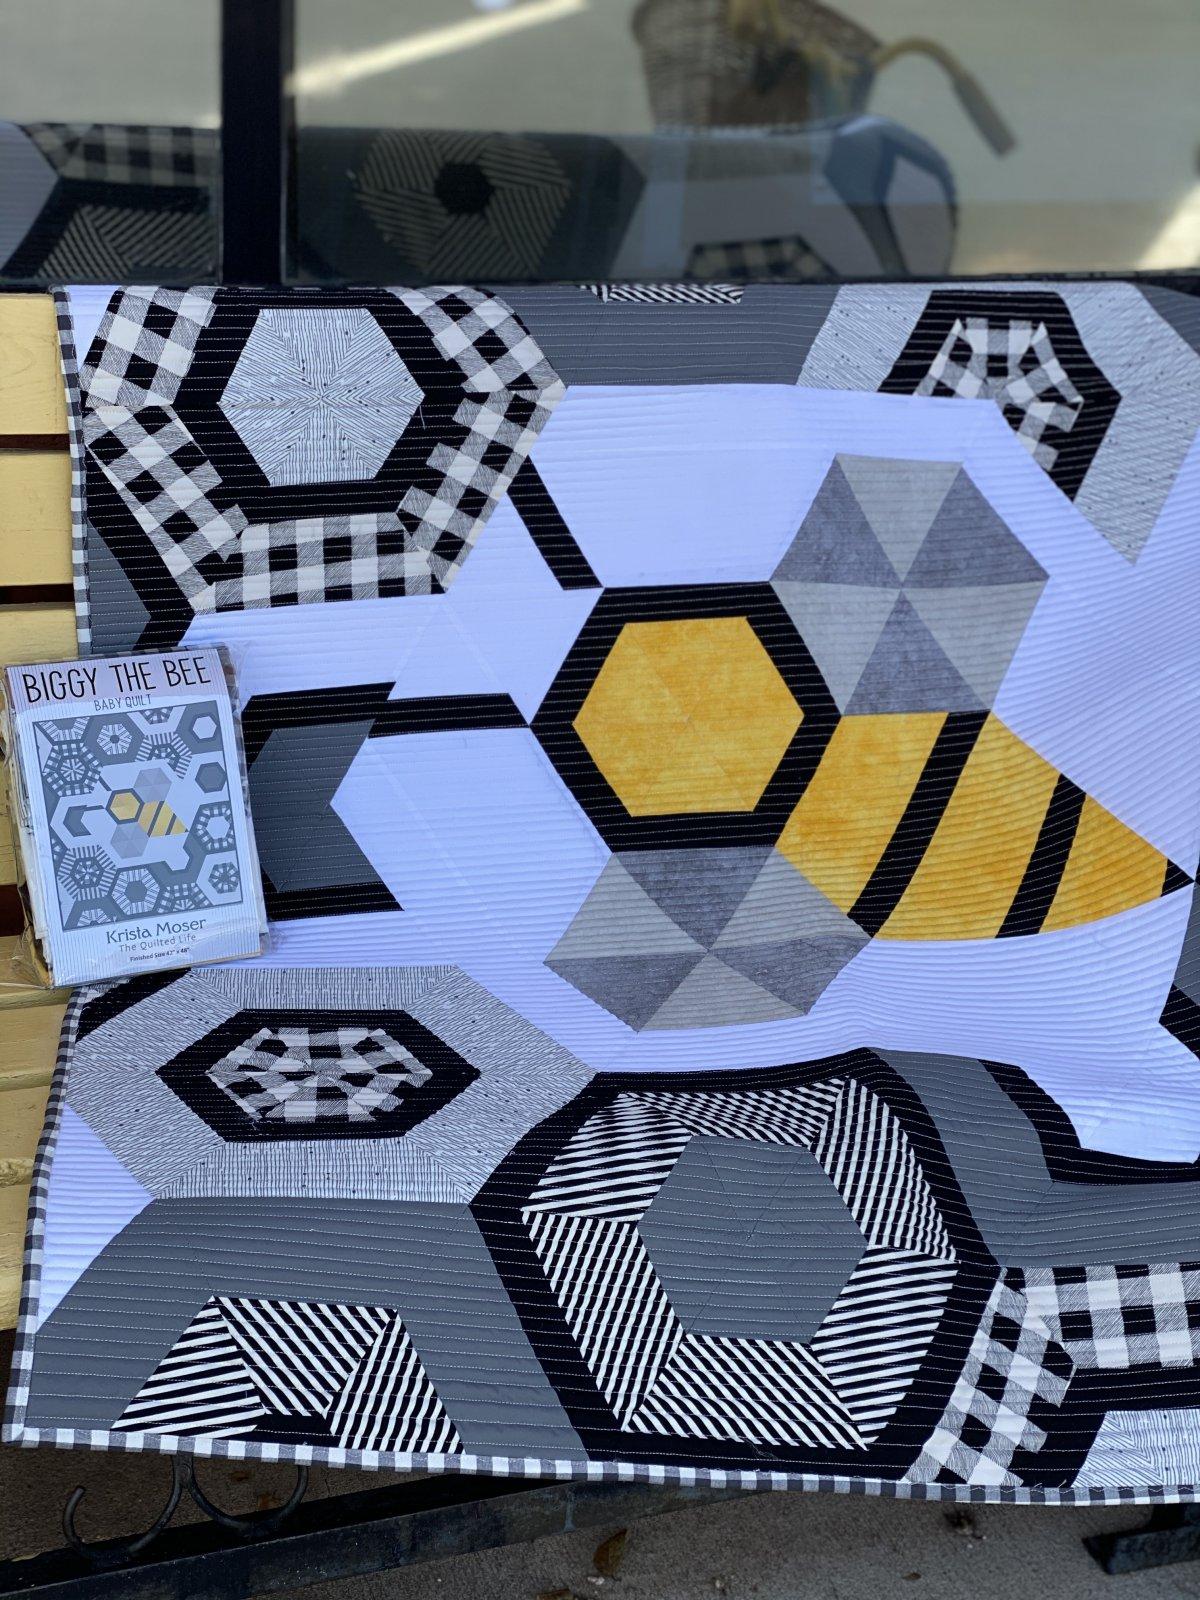 Biggy The Bee Baby quilt kit